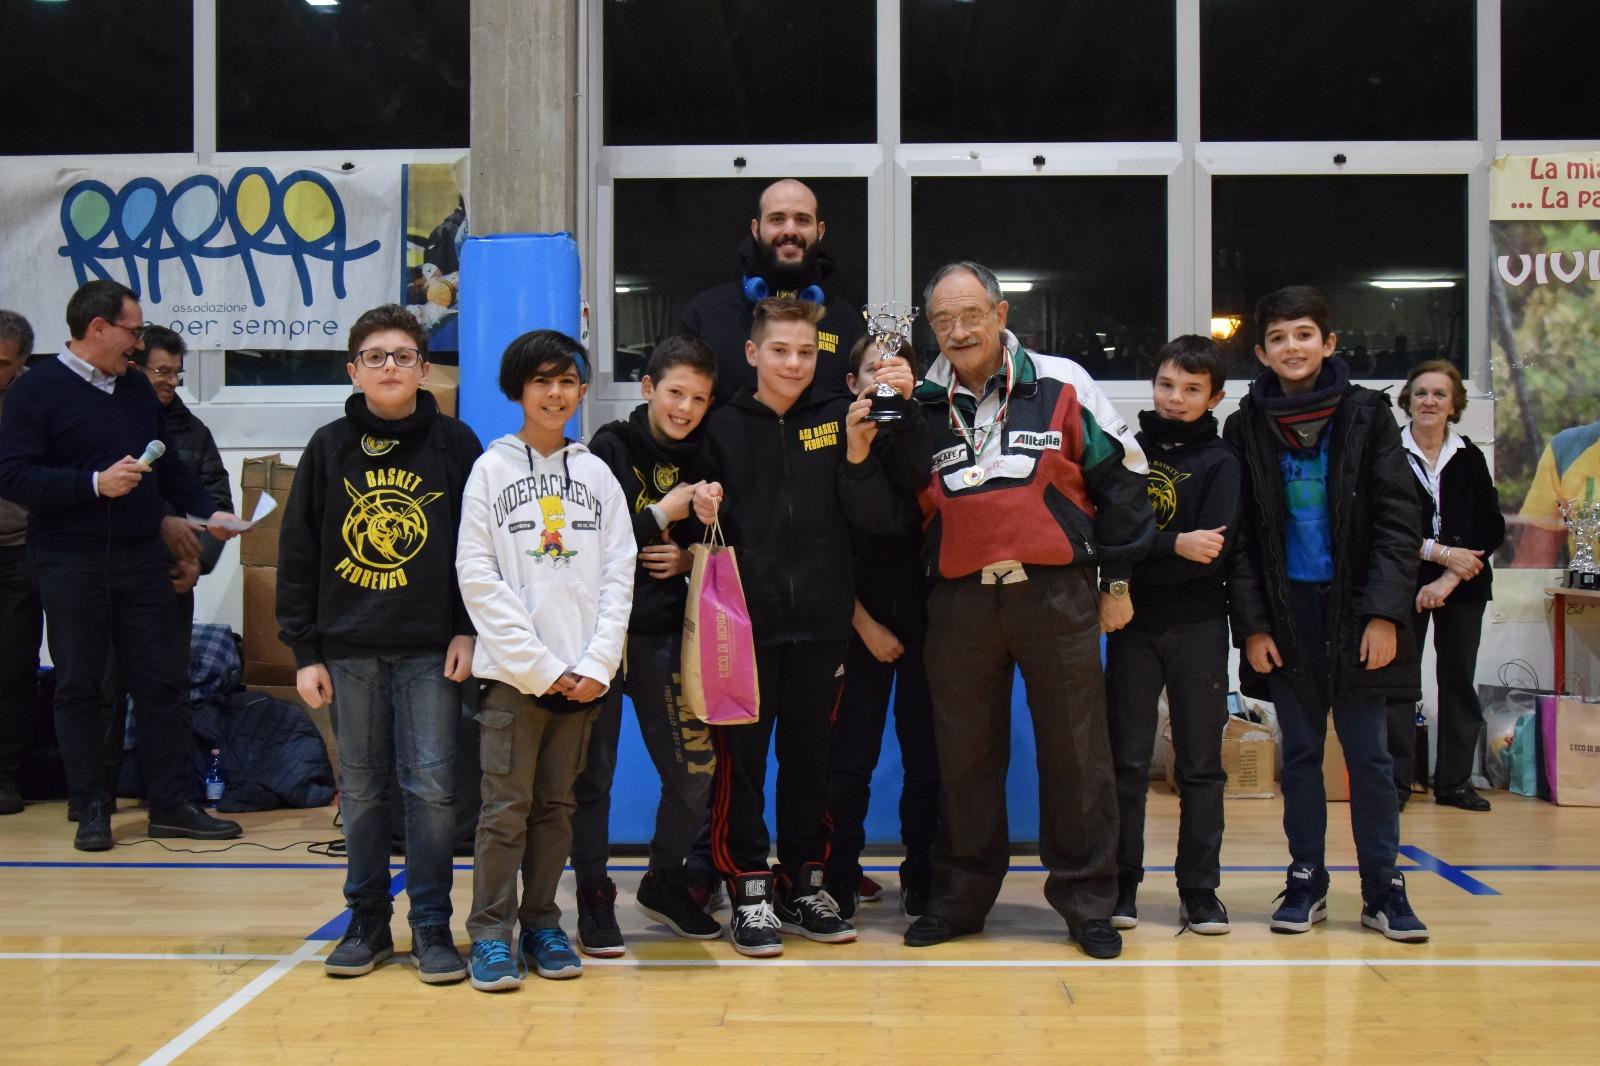 2017-12-29-esordienti-6-memorial-raffamartini-4